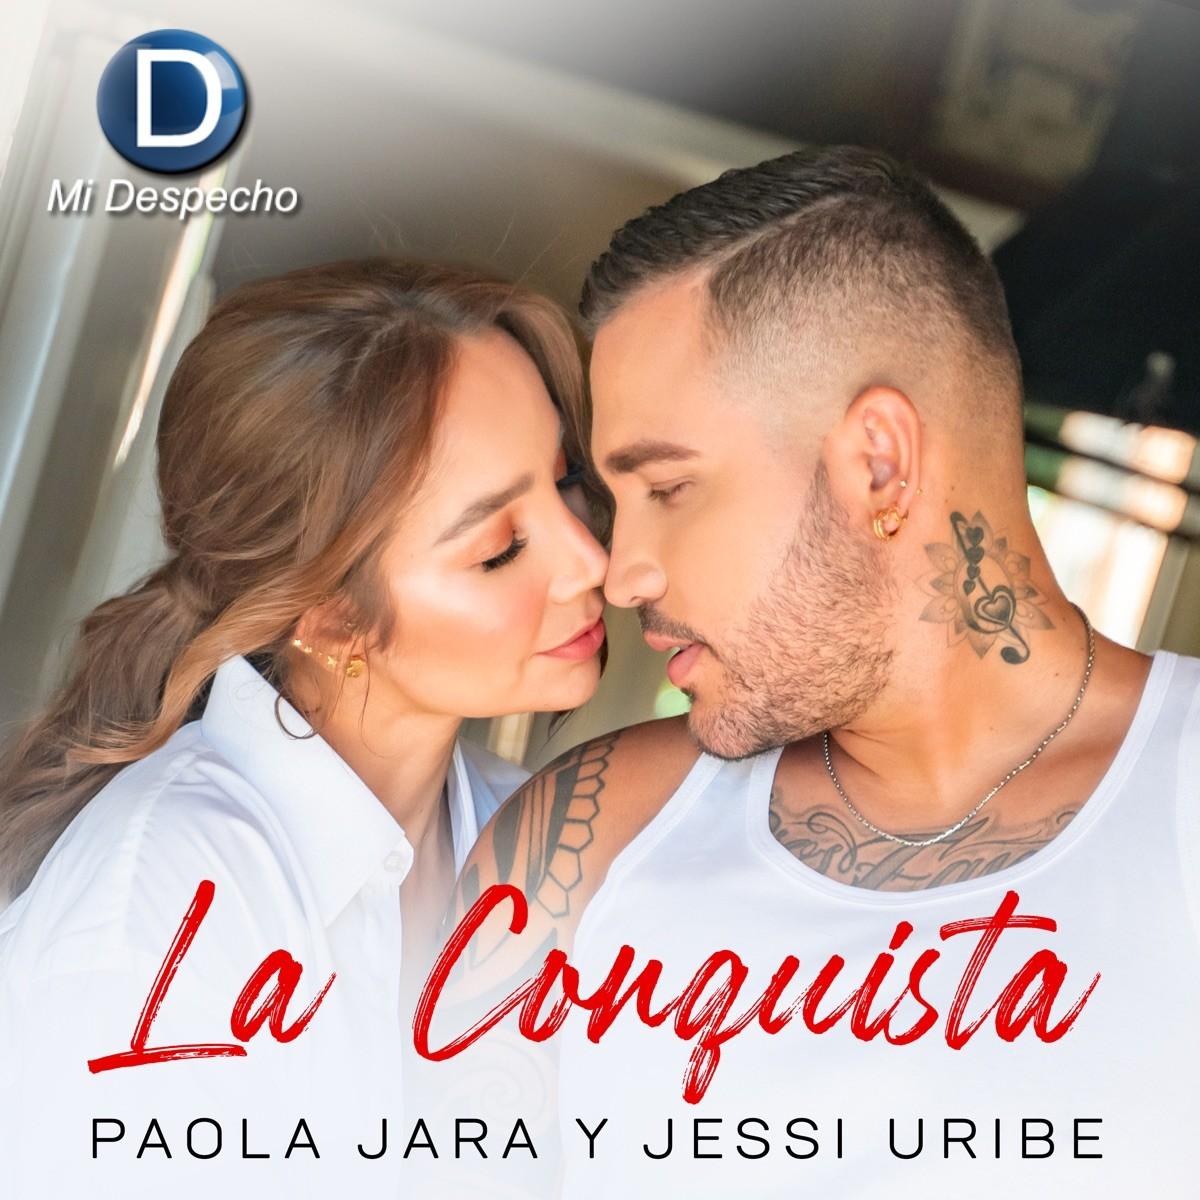 Paola Jara & Jessi Uribe La Conquista Frontal